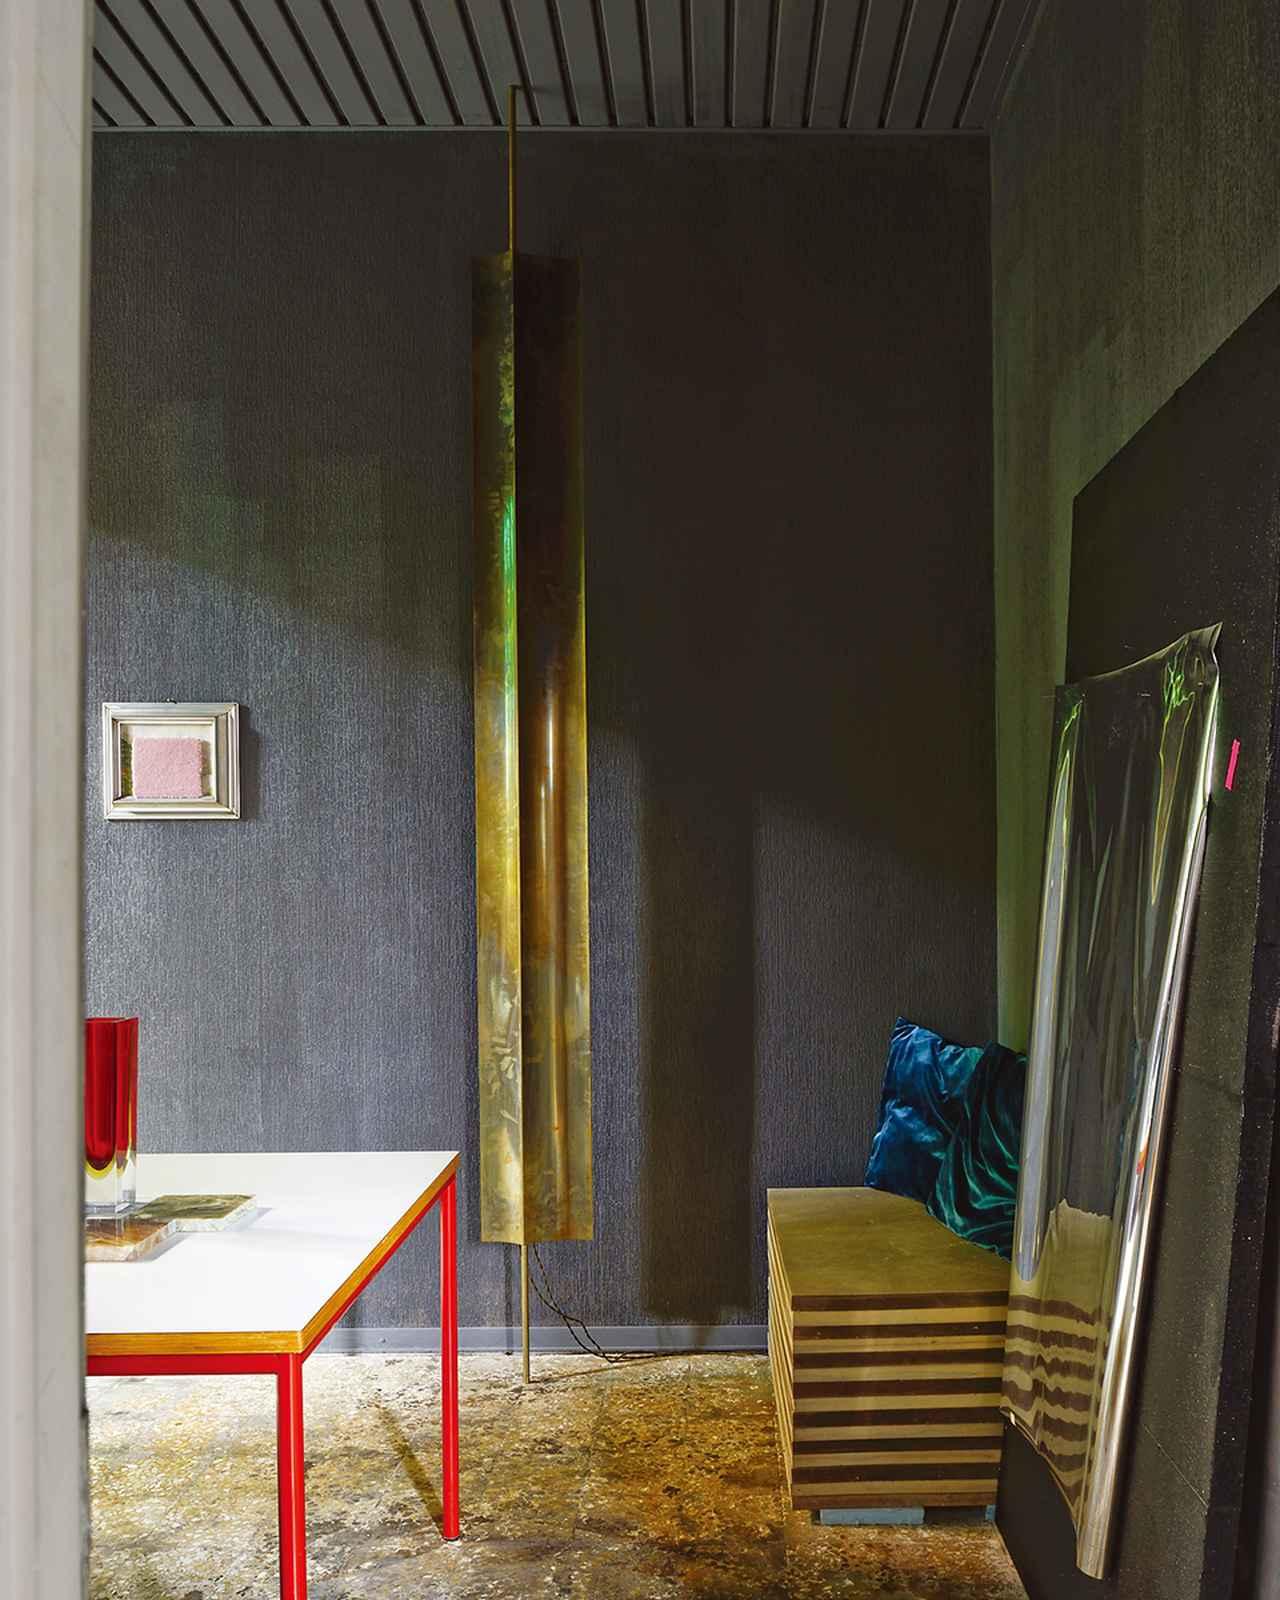 Images : 5番目の画像 - 「建築家トニョンが試みる 実験的な住まいのかたち」のアルバム - T JAPAN:The New York Times Style Magazine 公式サイト